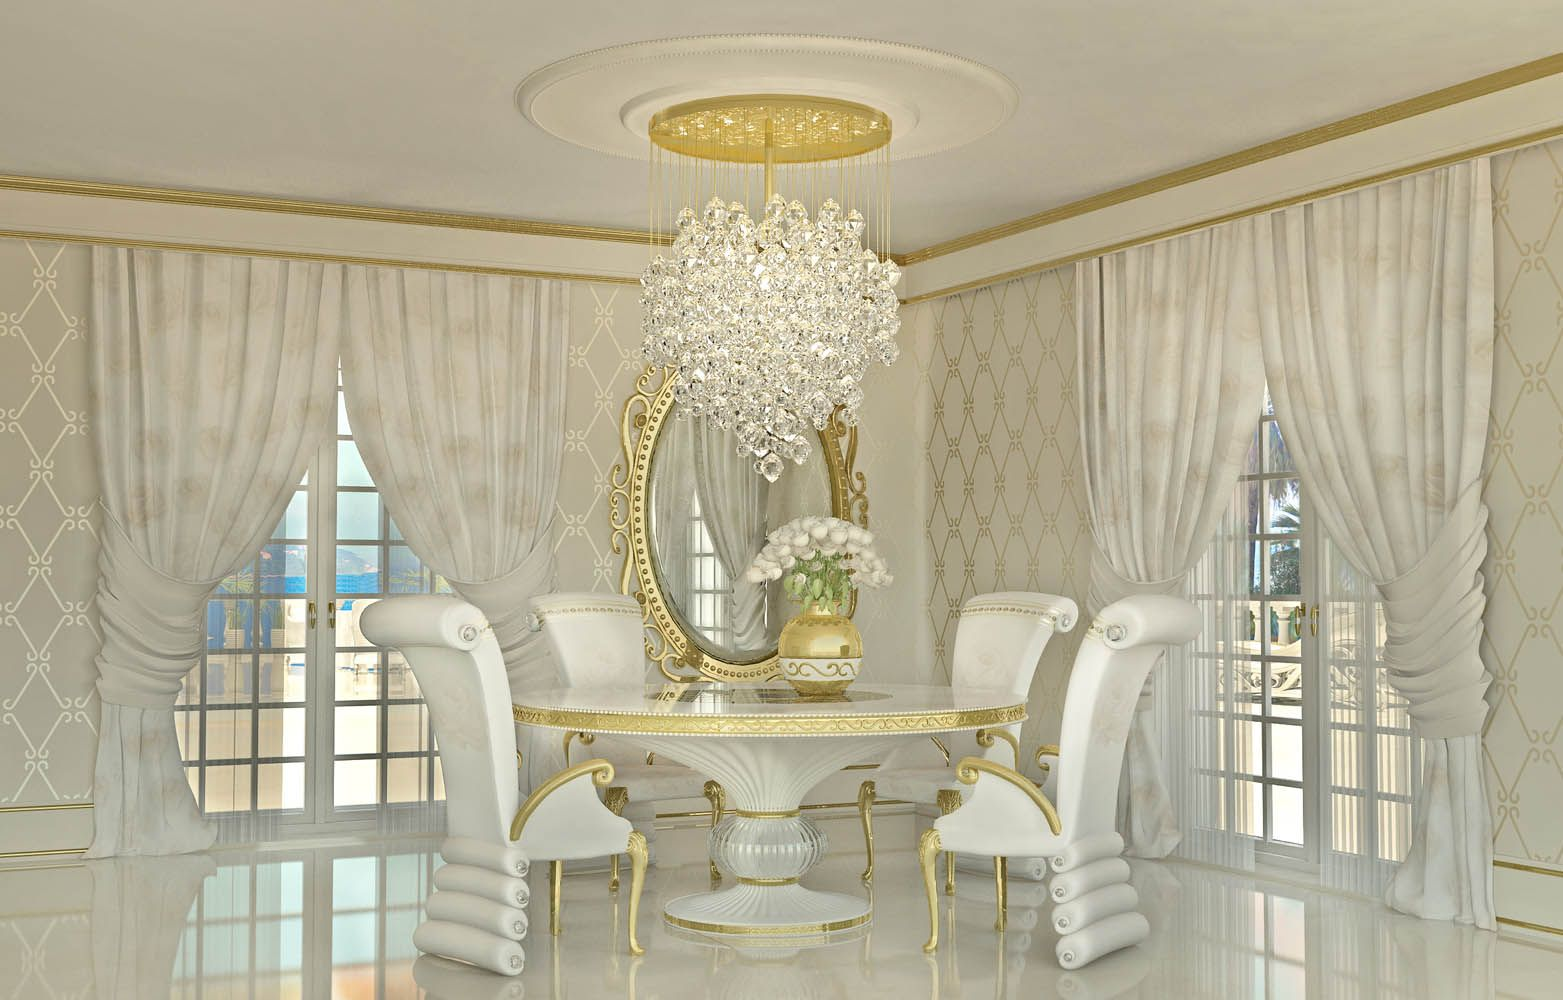 Lidia Bersani Luxury Interior Design beautiful white armchair